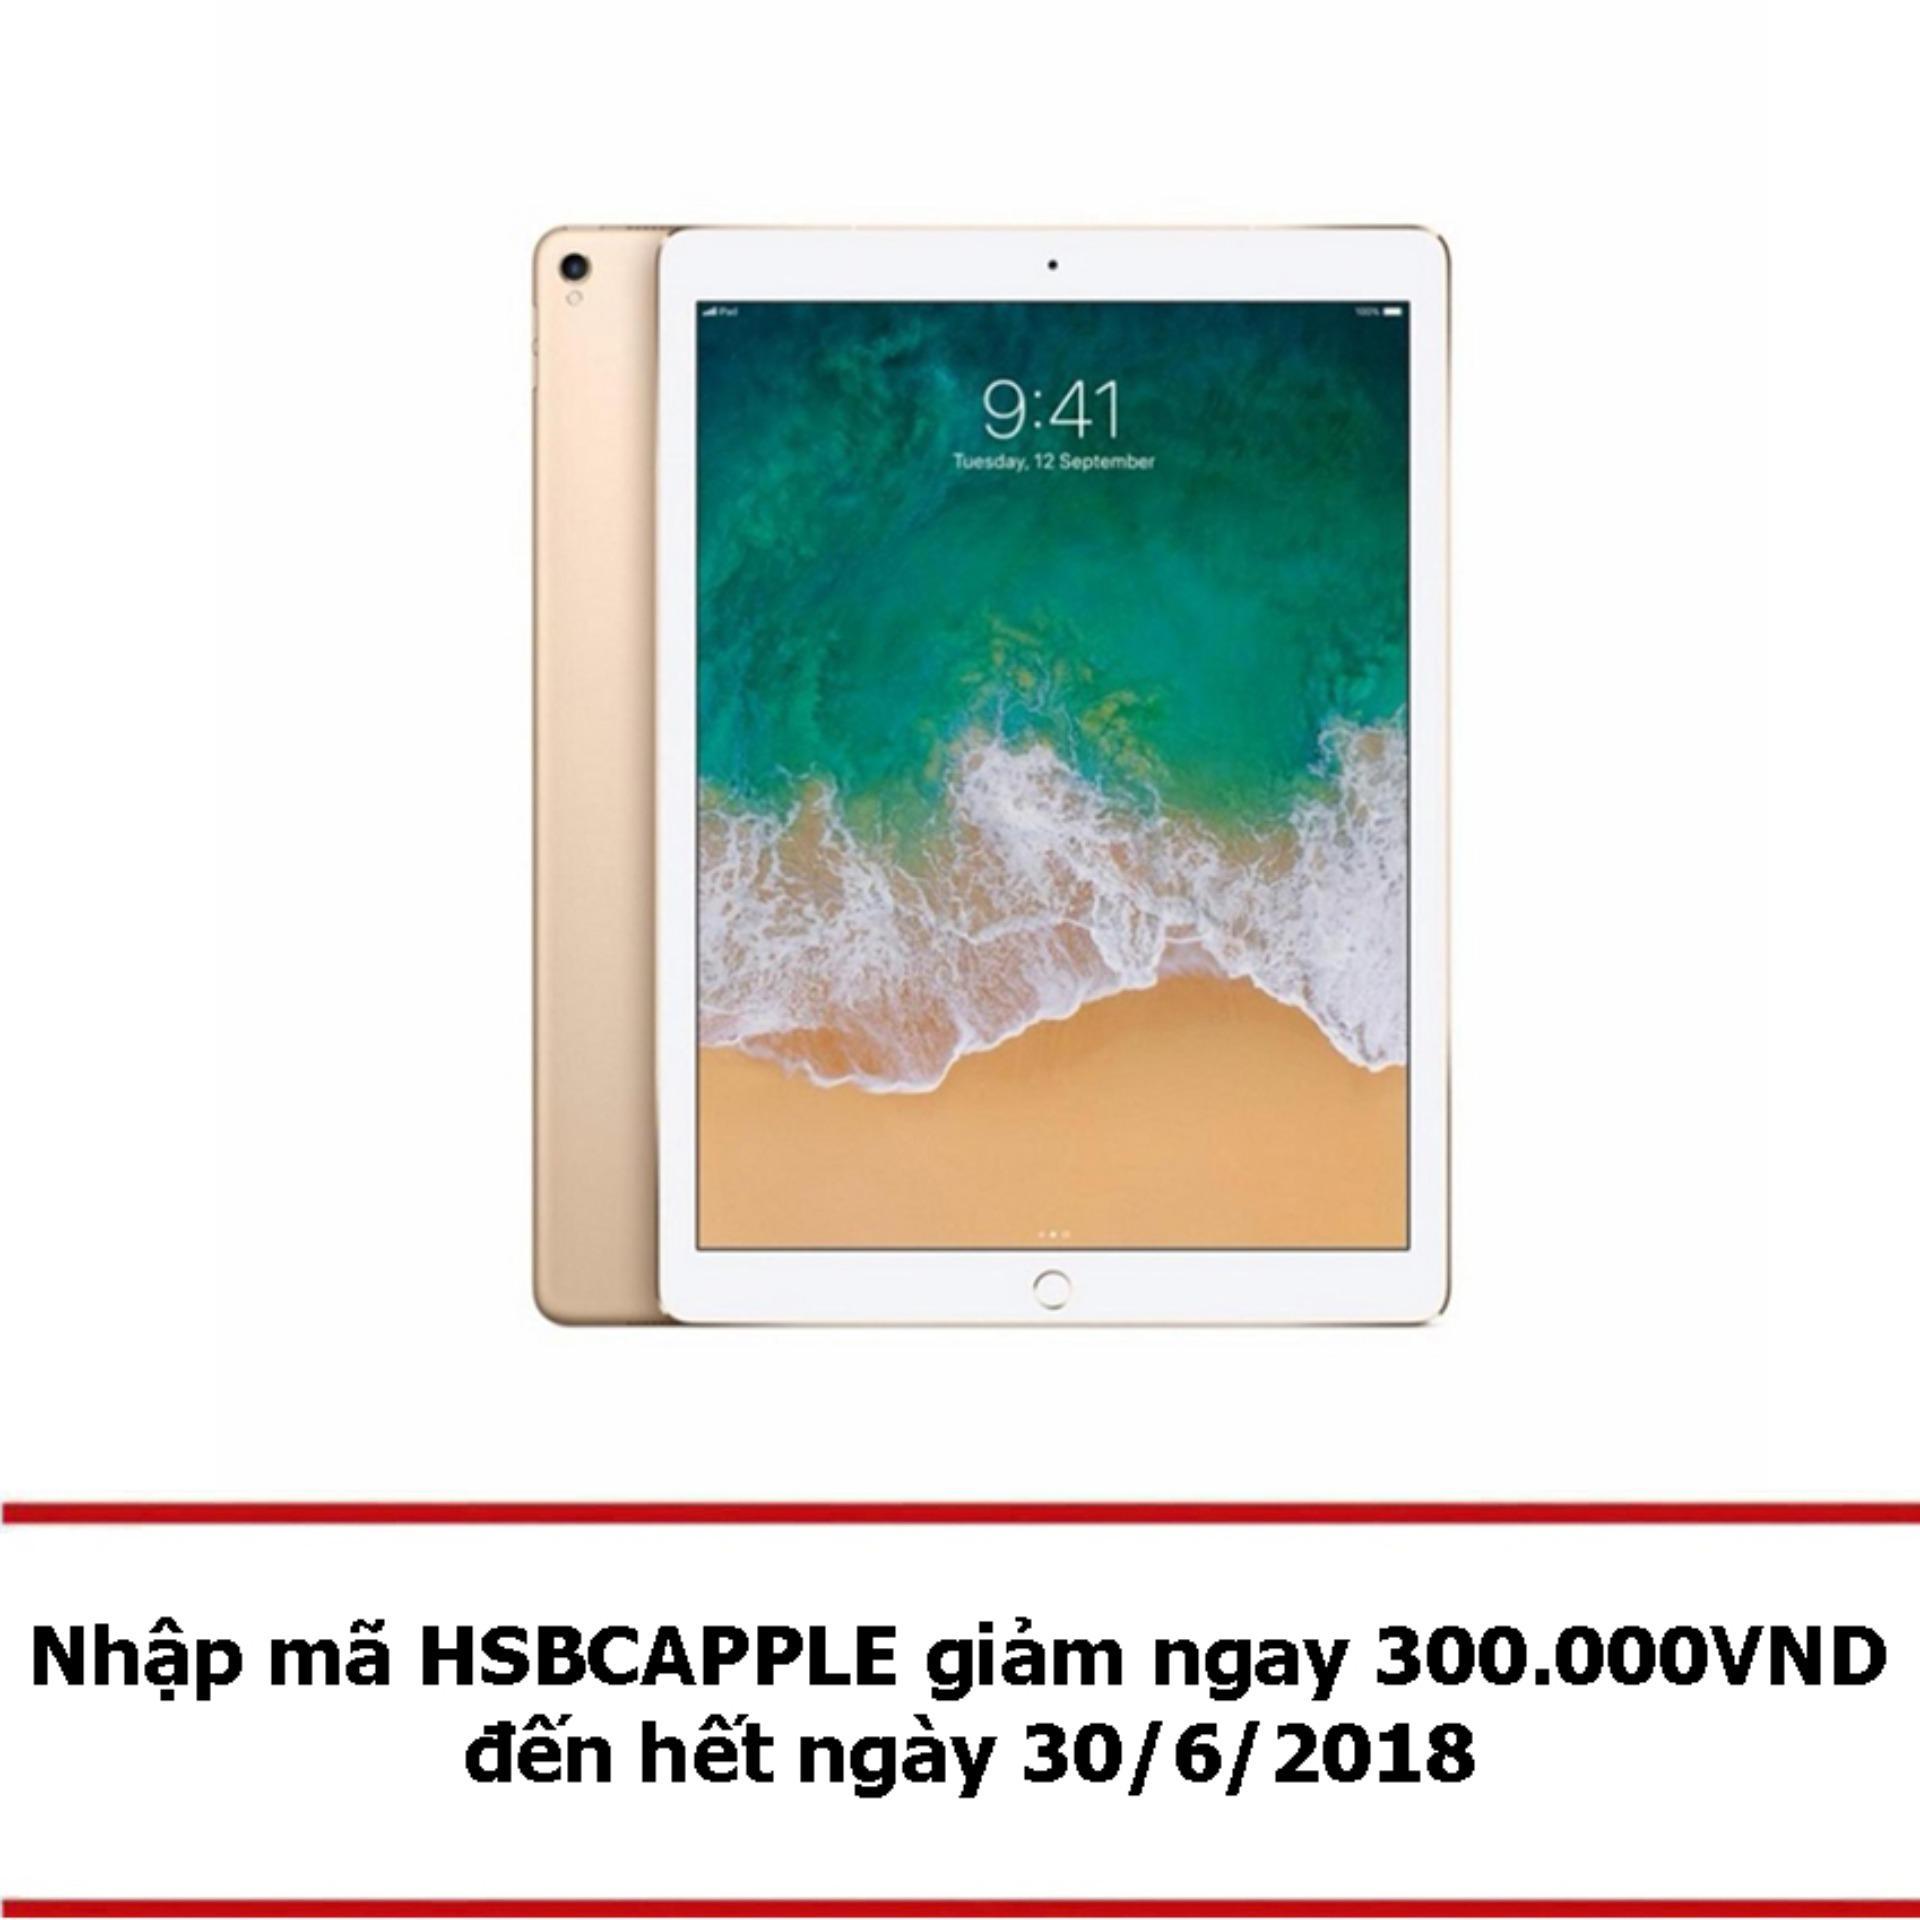 Apple iPad Pro 10.5-inch Wi-Fi 64GB Gold